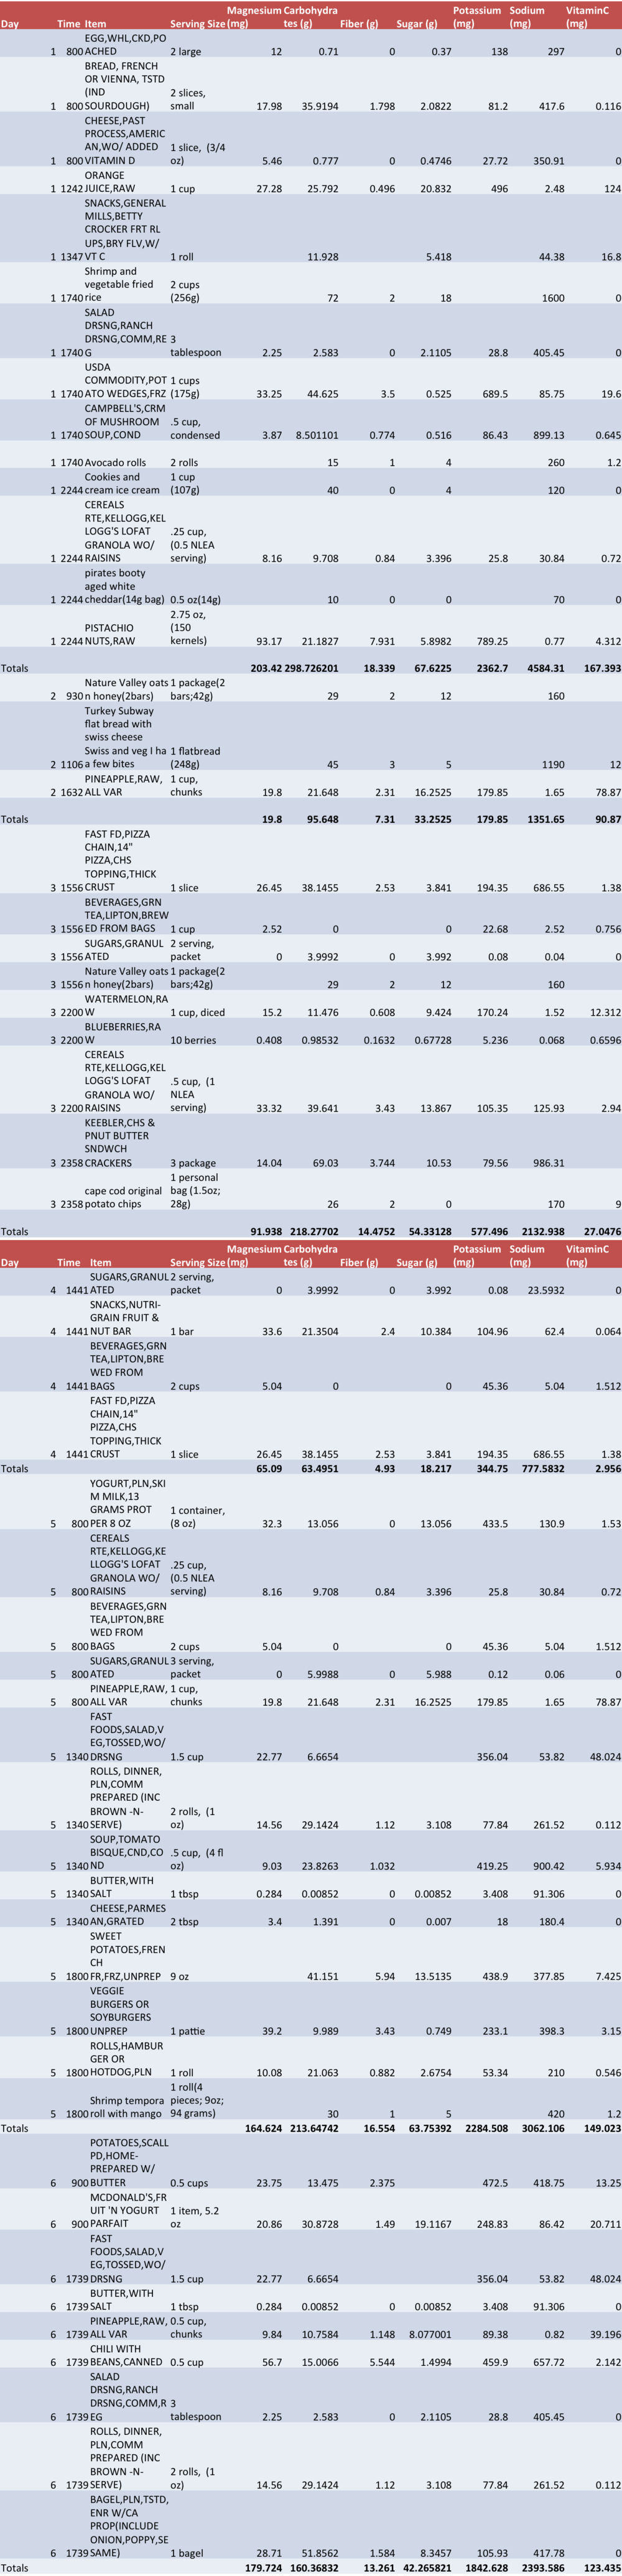 jnweek1 table2.png